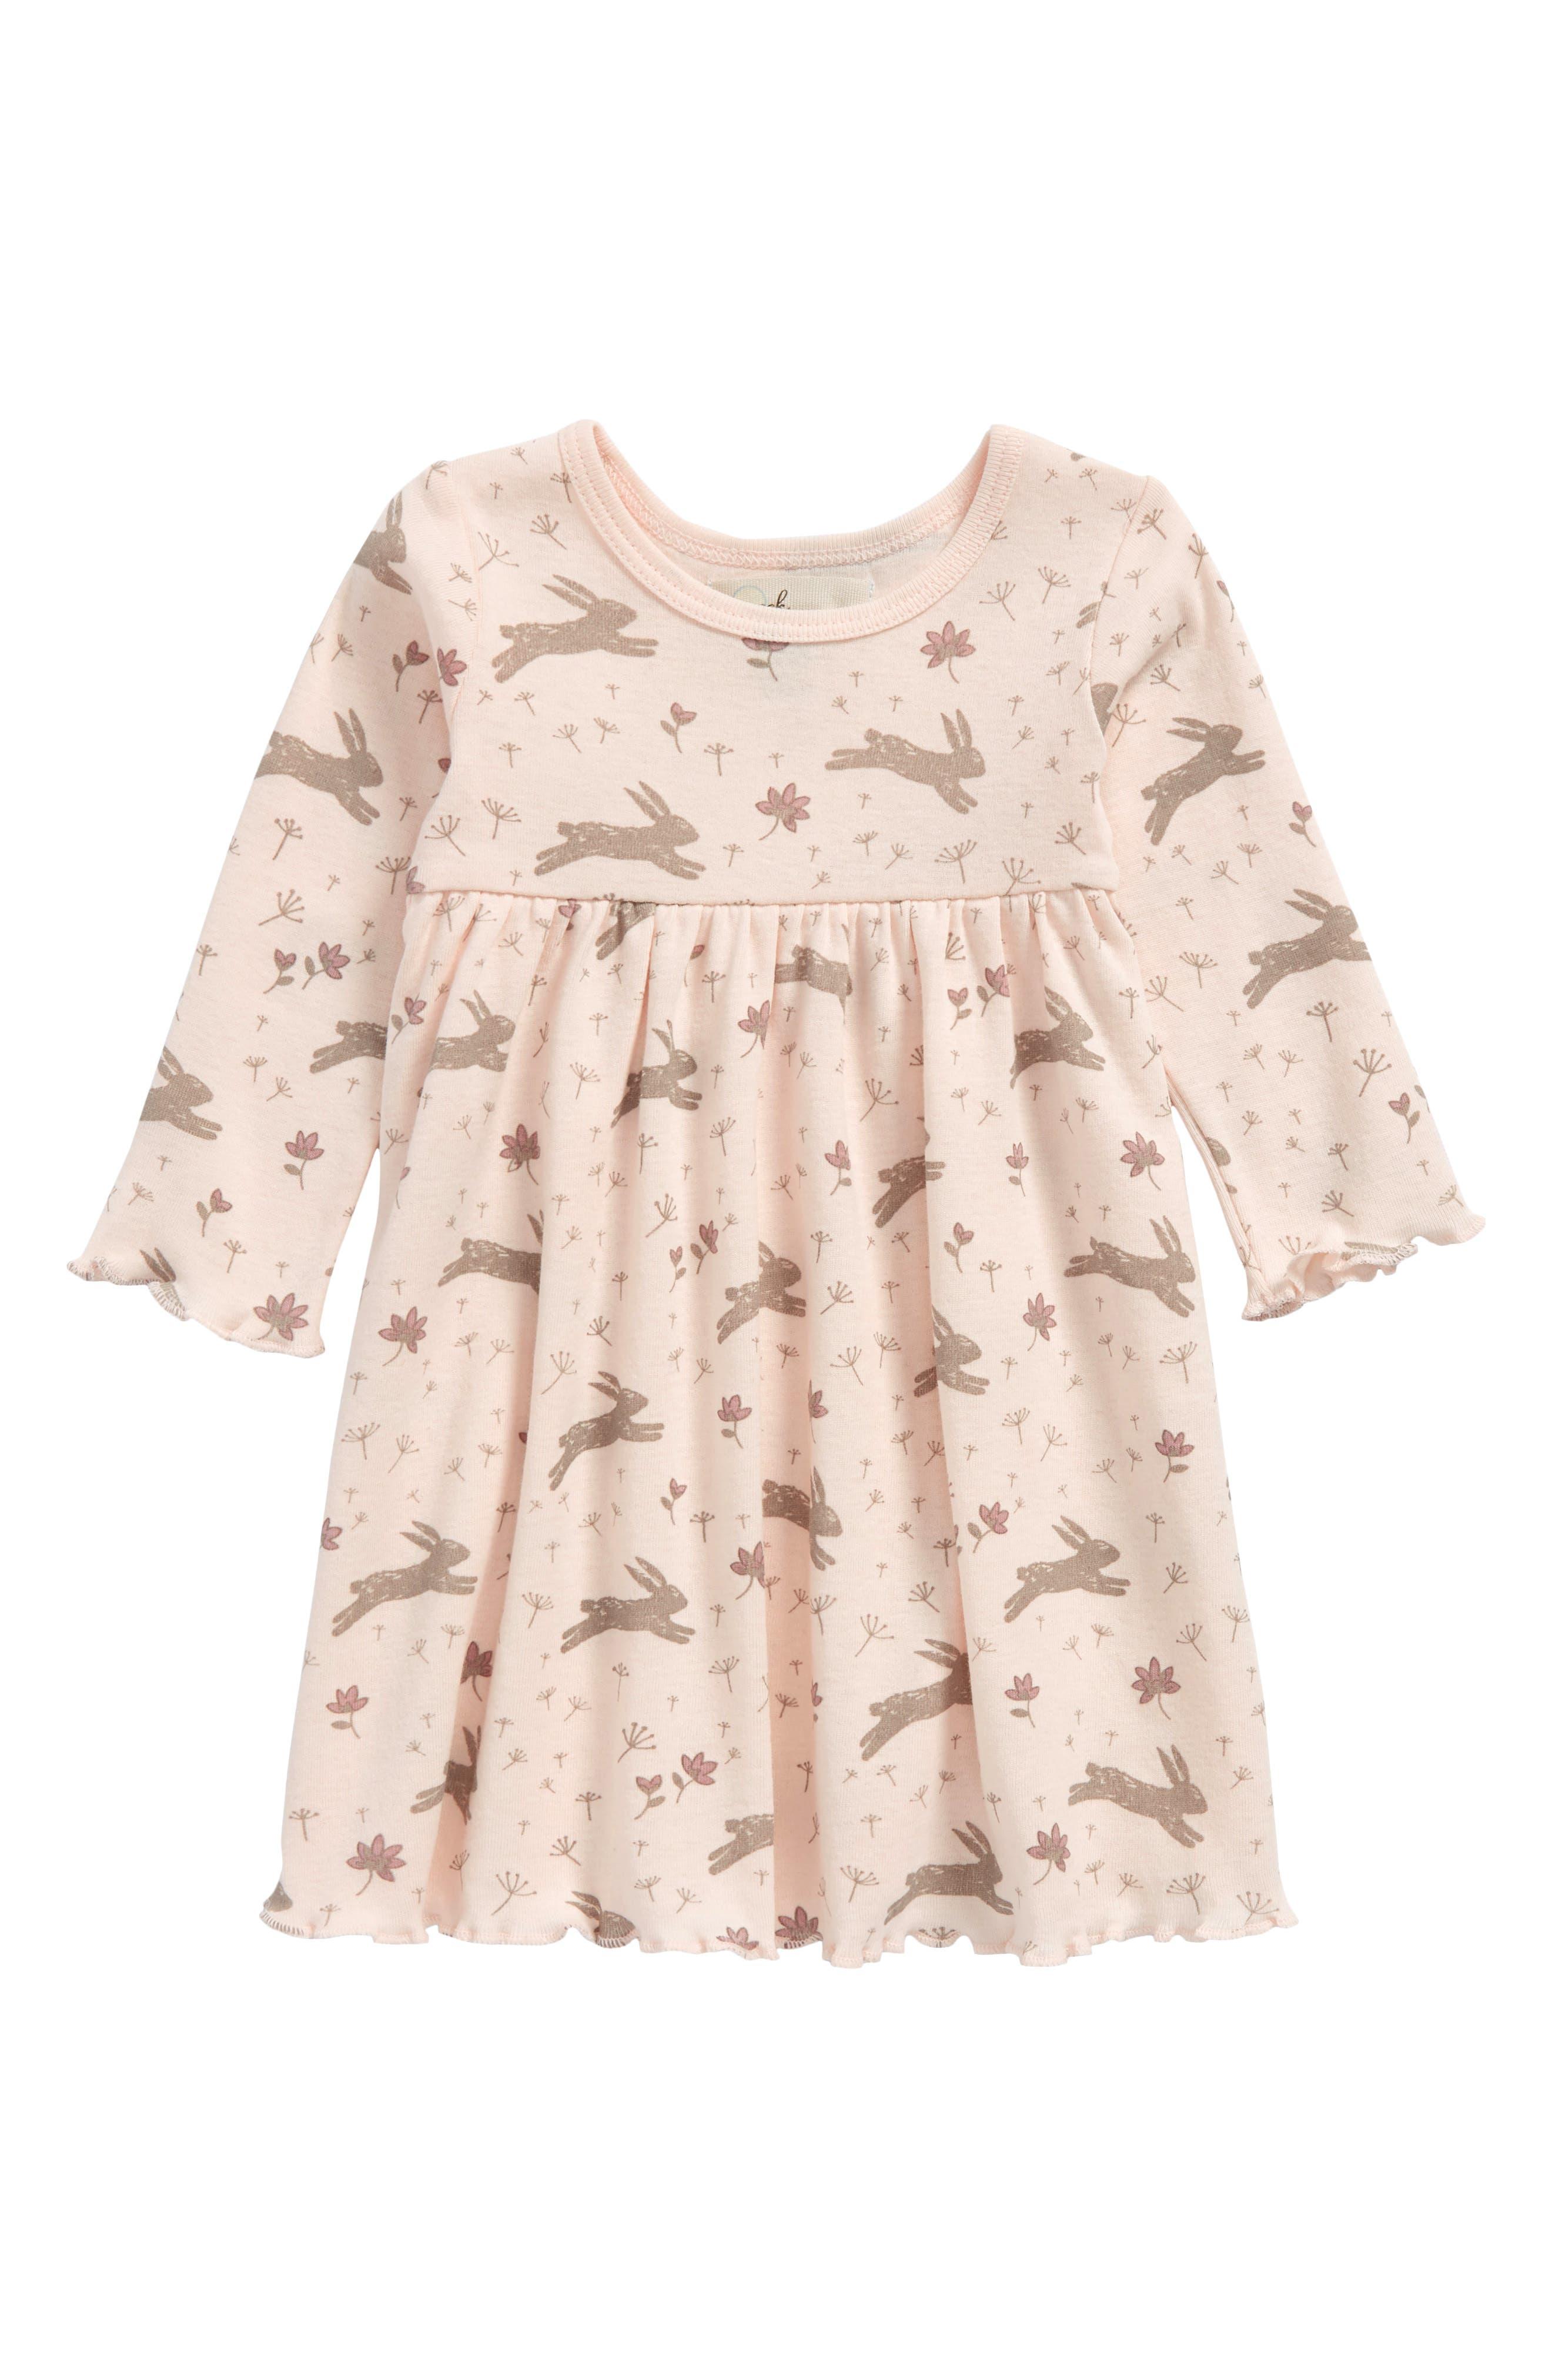 Peek Bunny Dress,                             Main thumbnail 1, color,                             Light Pink